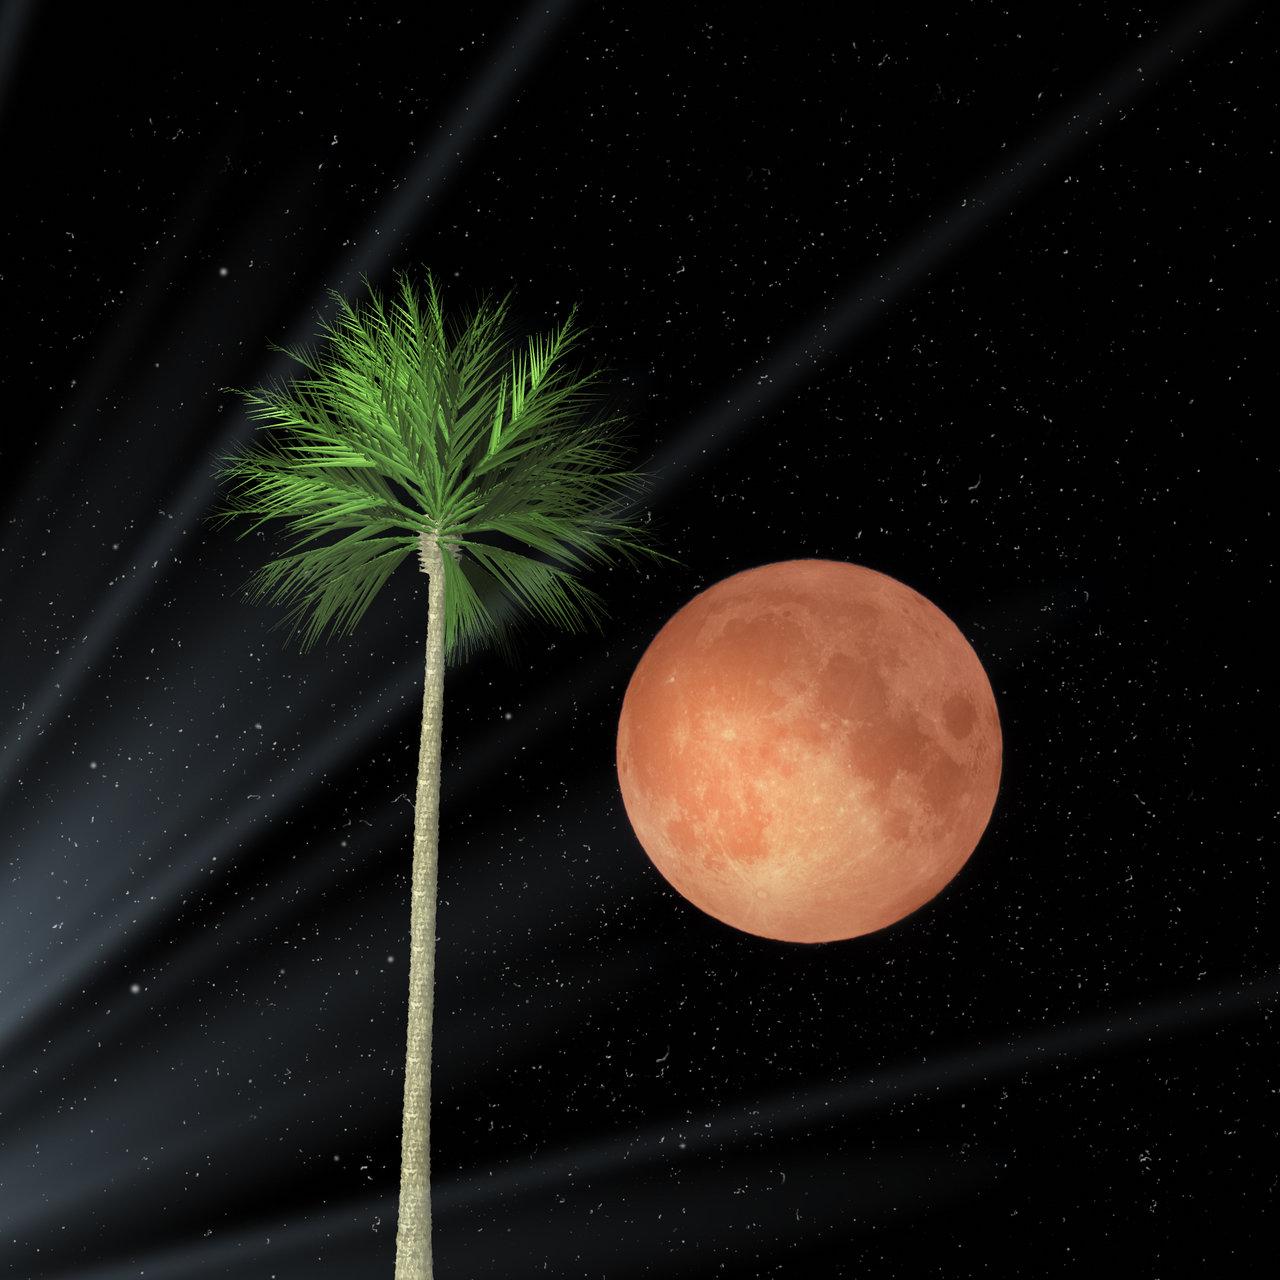 red moon & palm | Author Nikki Georgieva  V E G A N I K - vega_nik | PHOTO FORUM